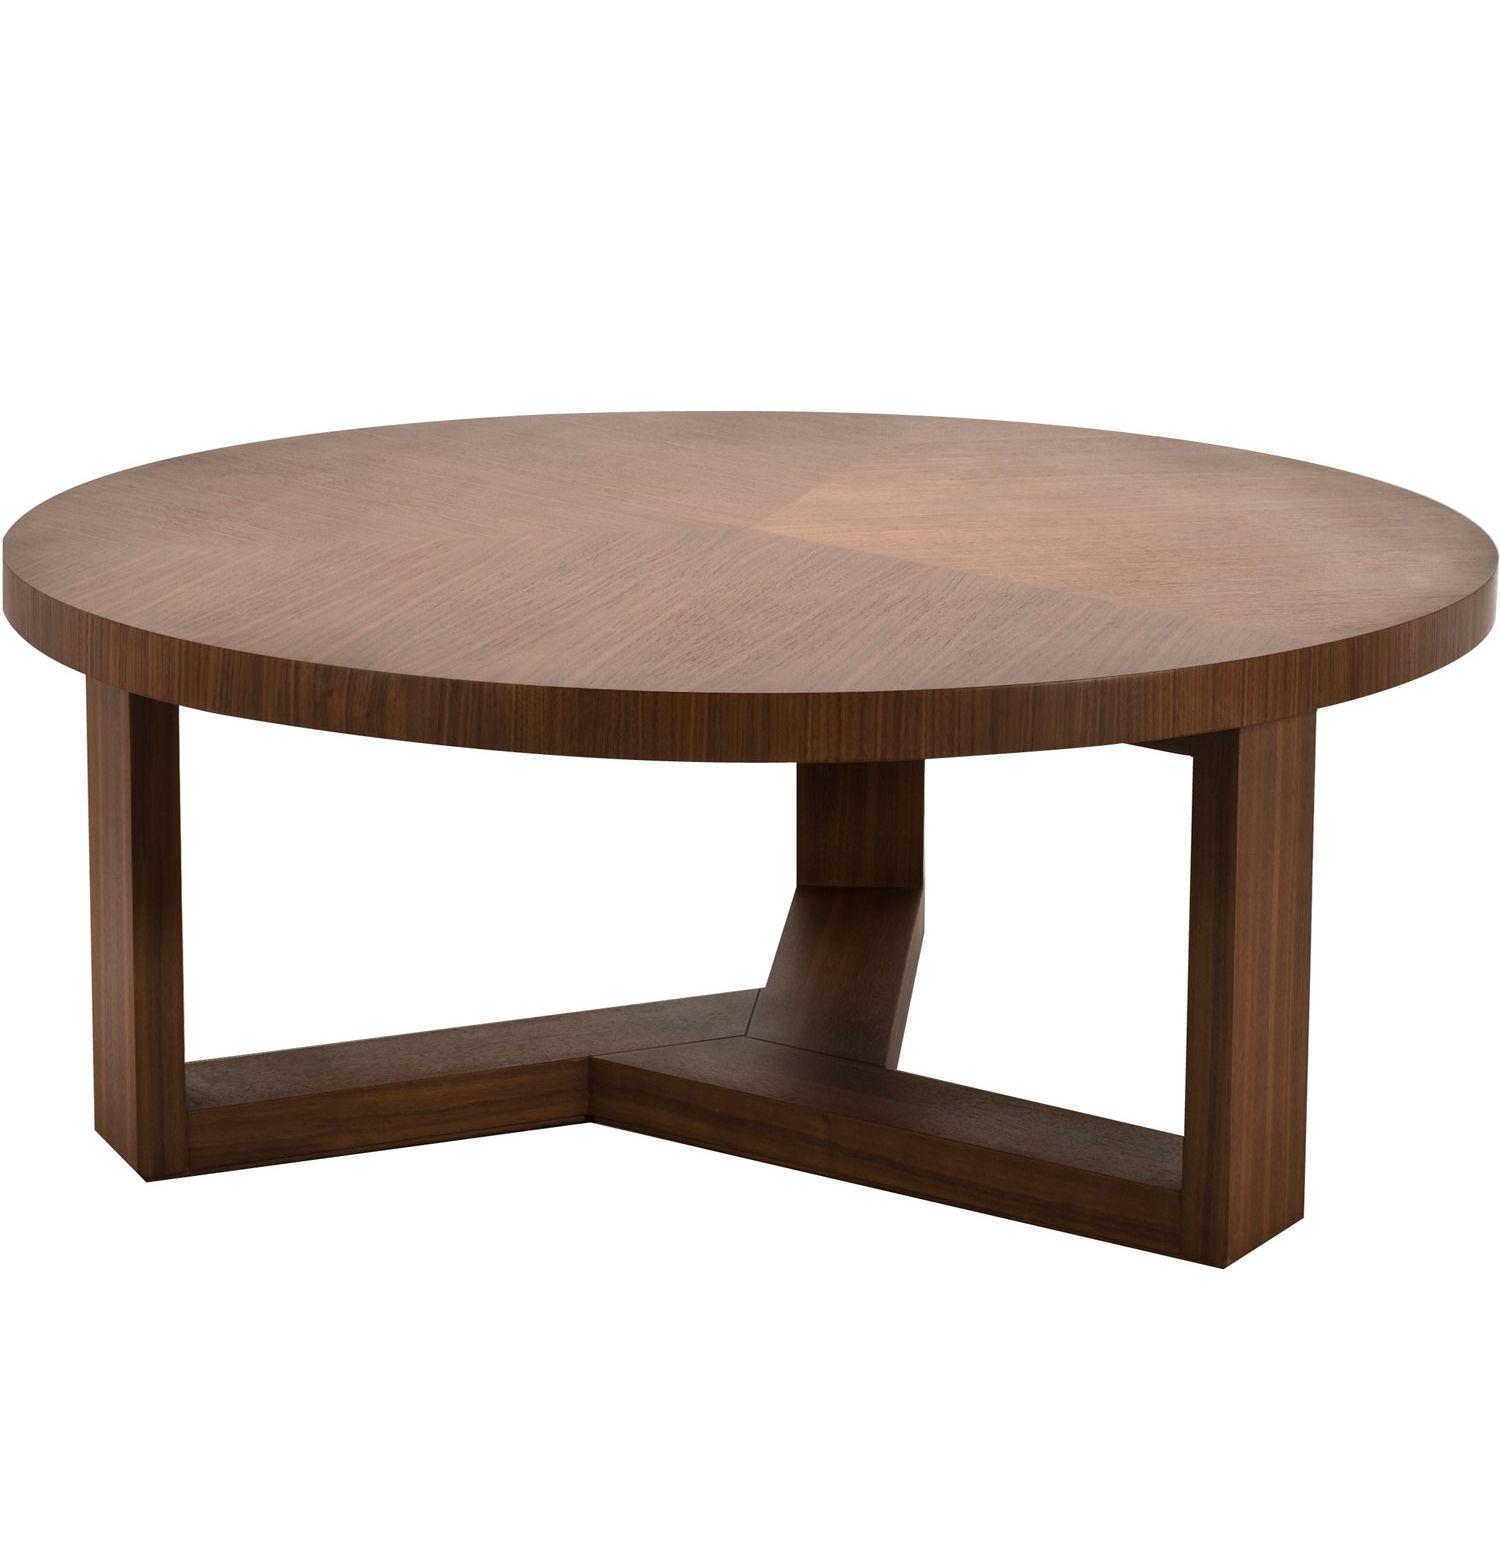 Round Table Coffee Original Linea Tripod Round Coffee Table Matt Blatt On Sale